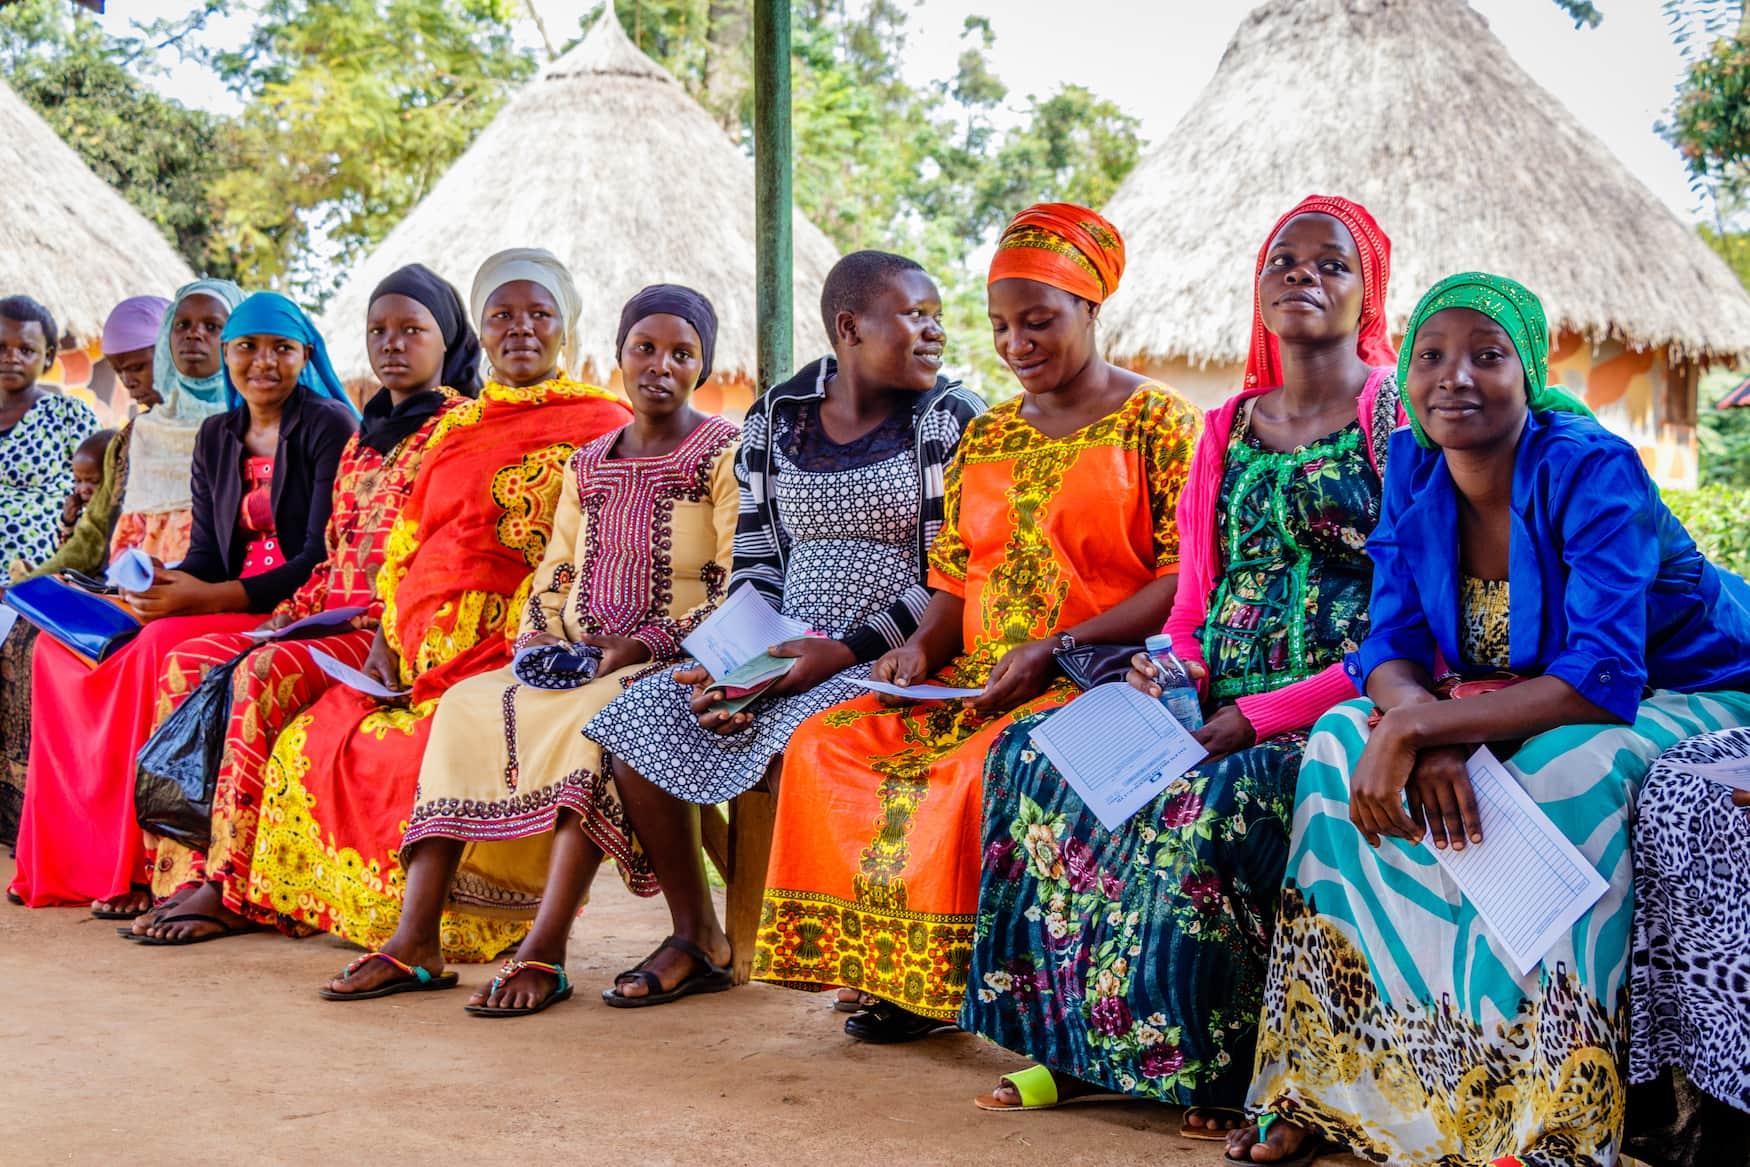 Frauen in bunten Kleidern in Ruanda